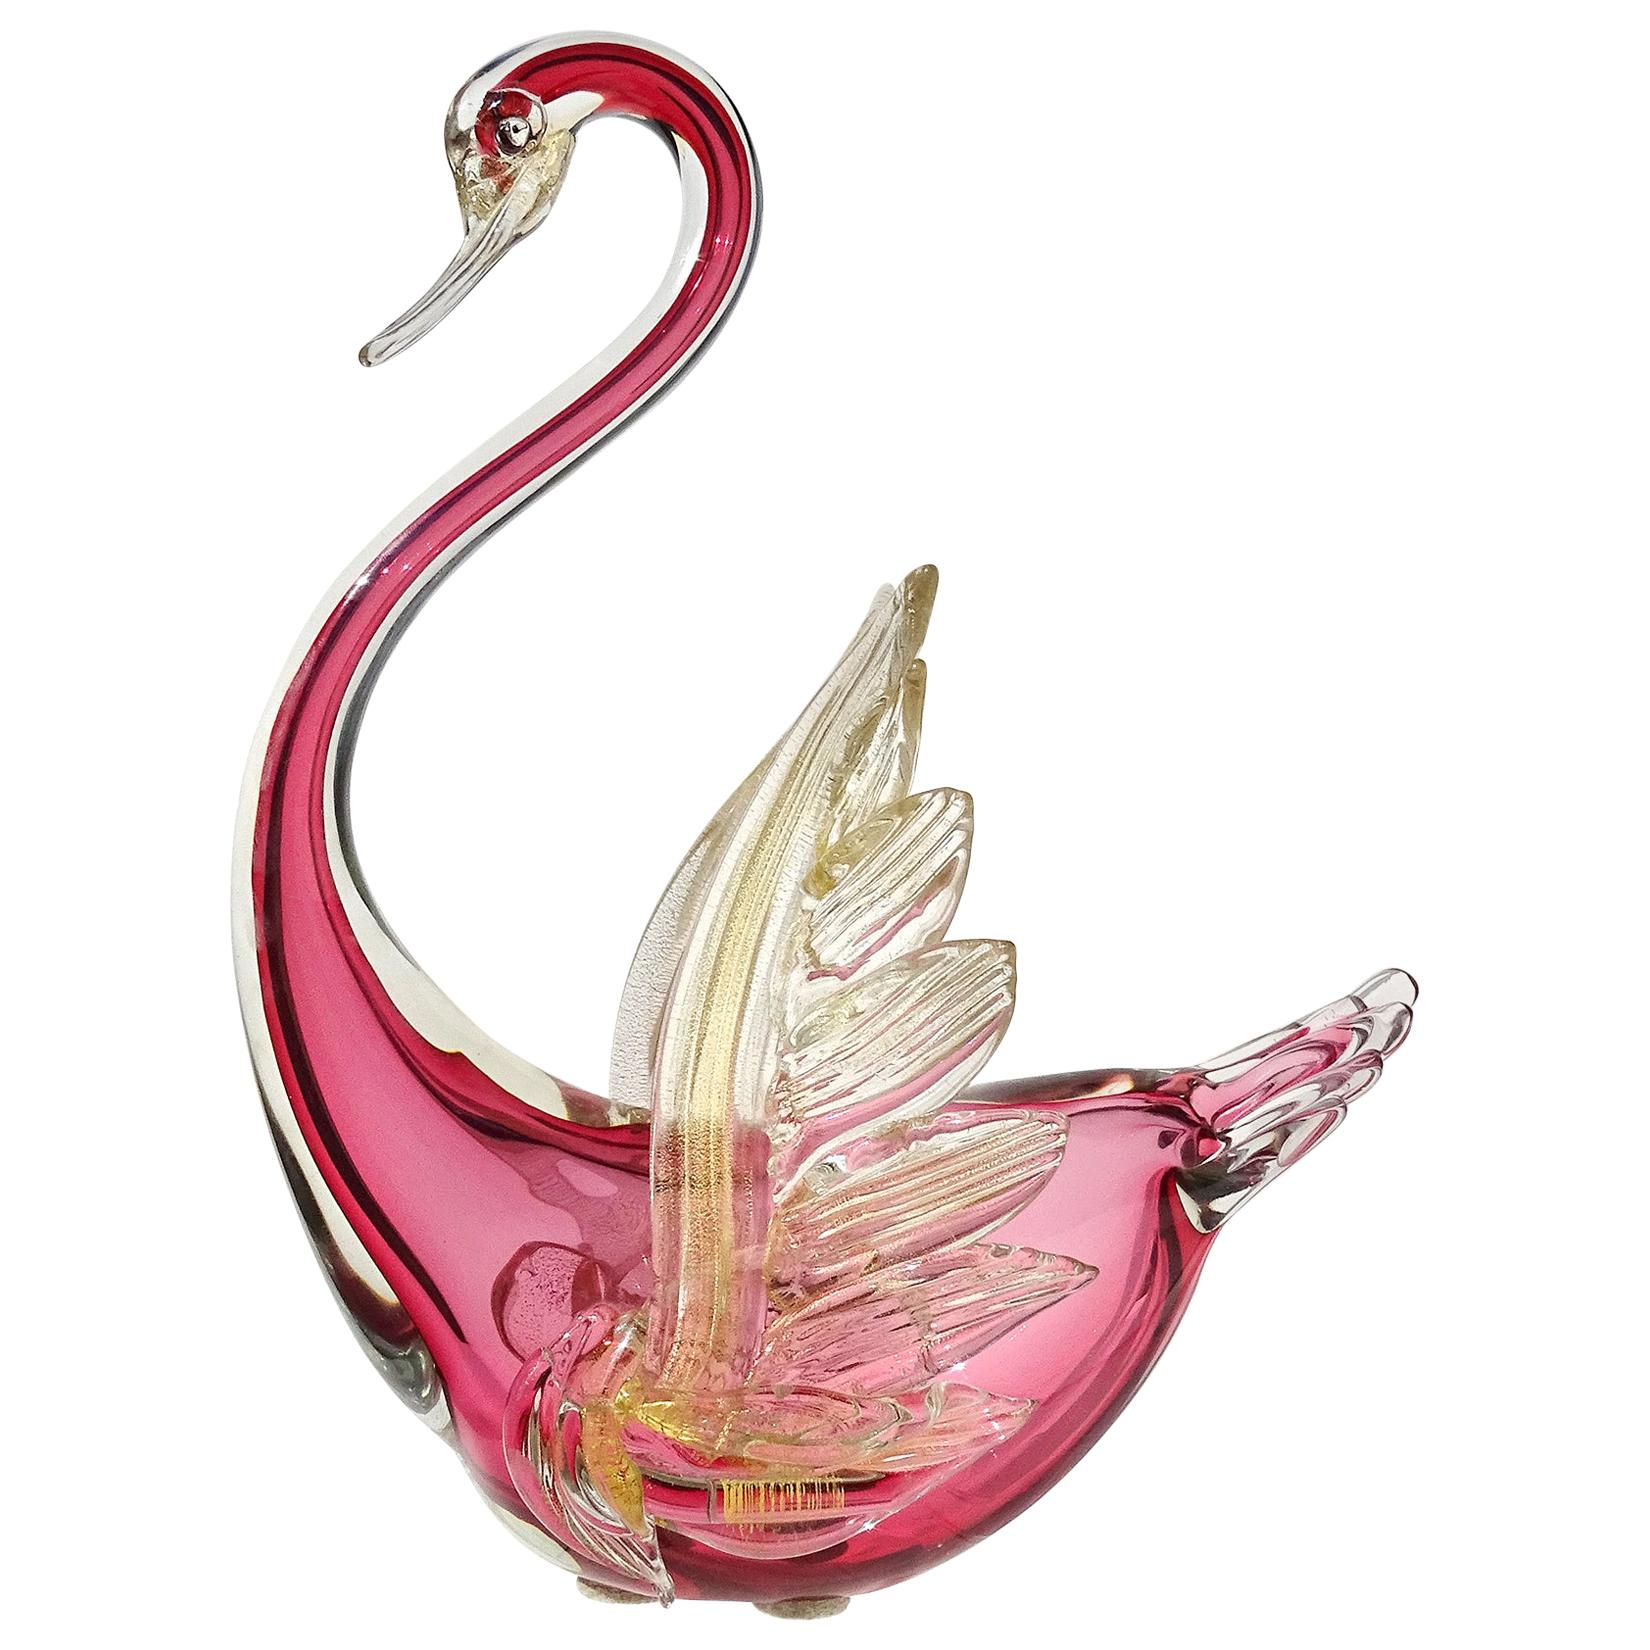 Barbini Murano Sommerso Red Gold Flecks Italian Art Glass Swan Bird Sculpture